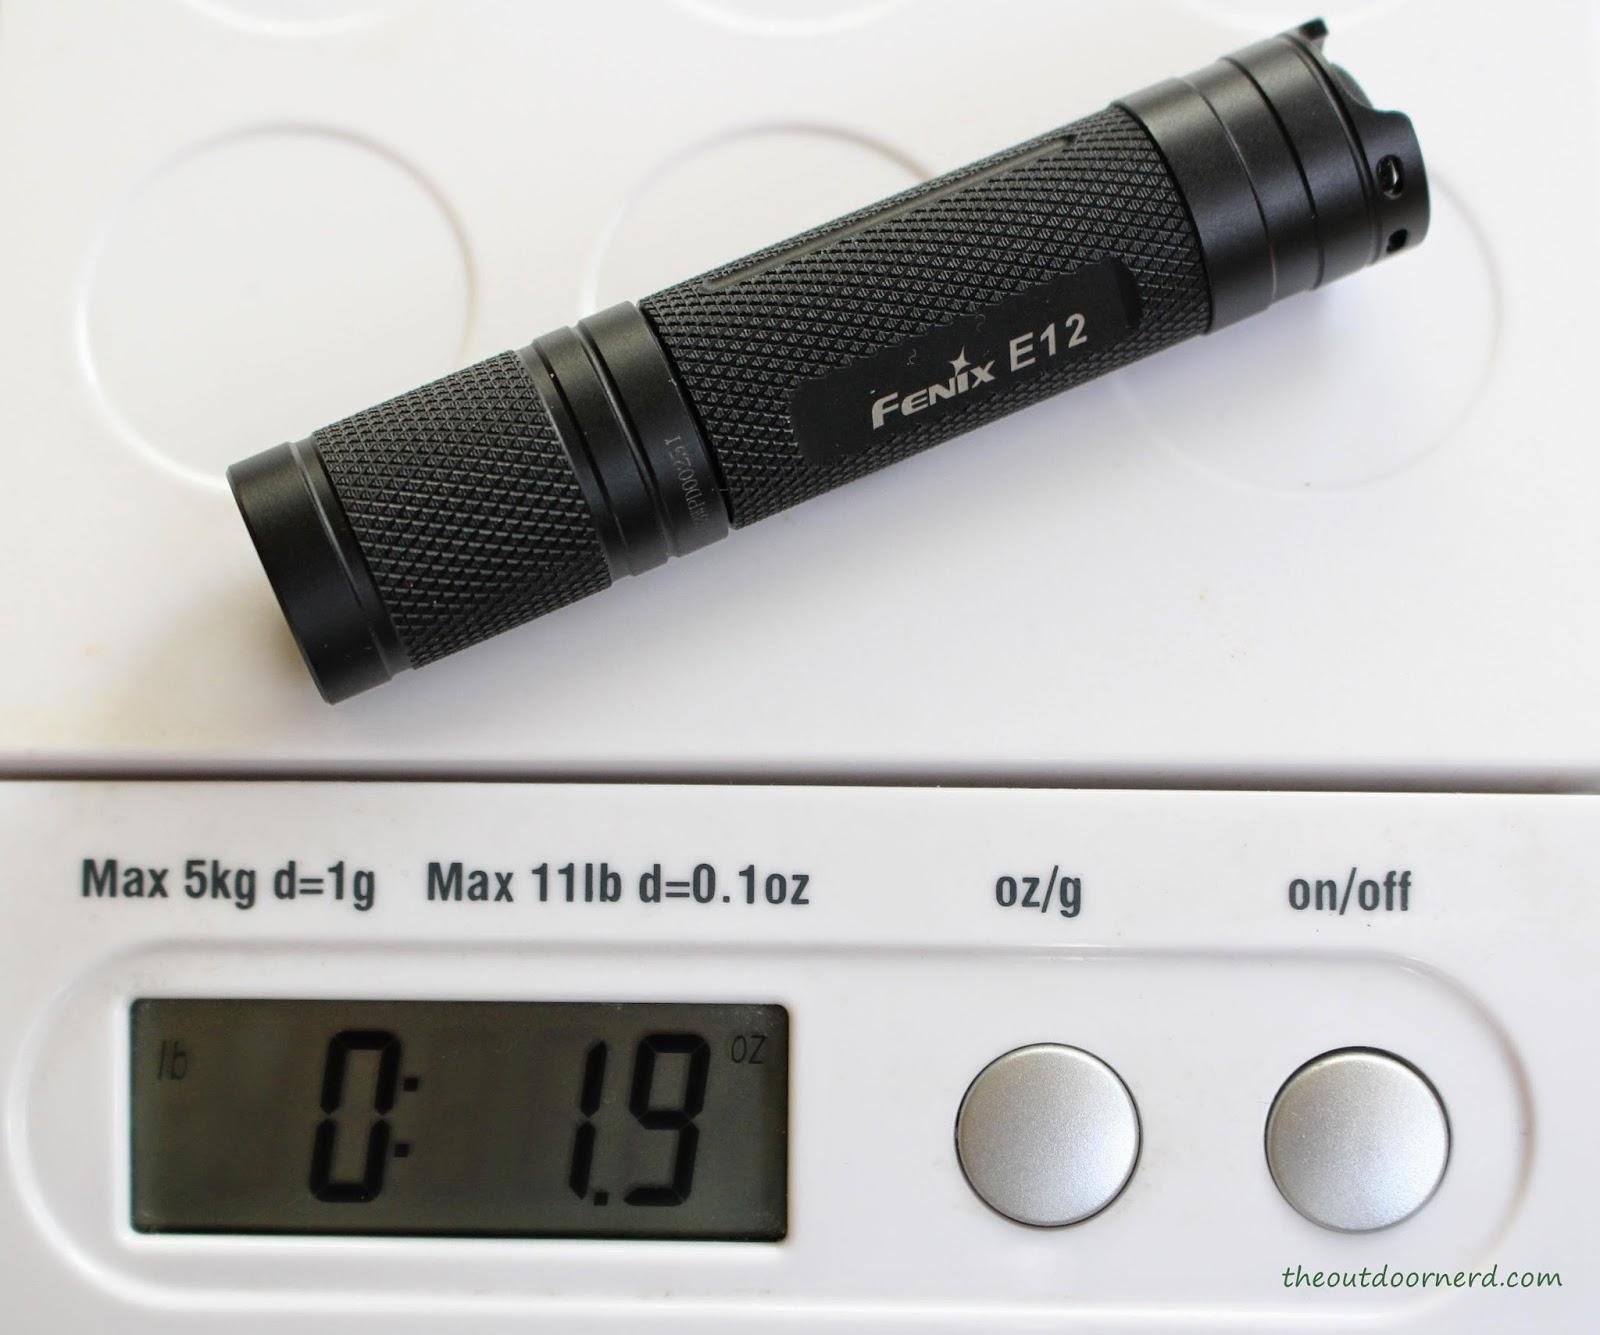 Fenix E12 1xAA EDC Flashlight On Scale